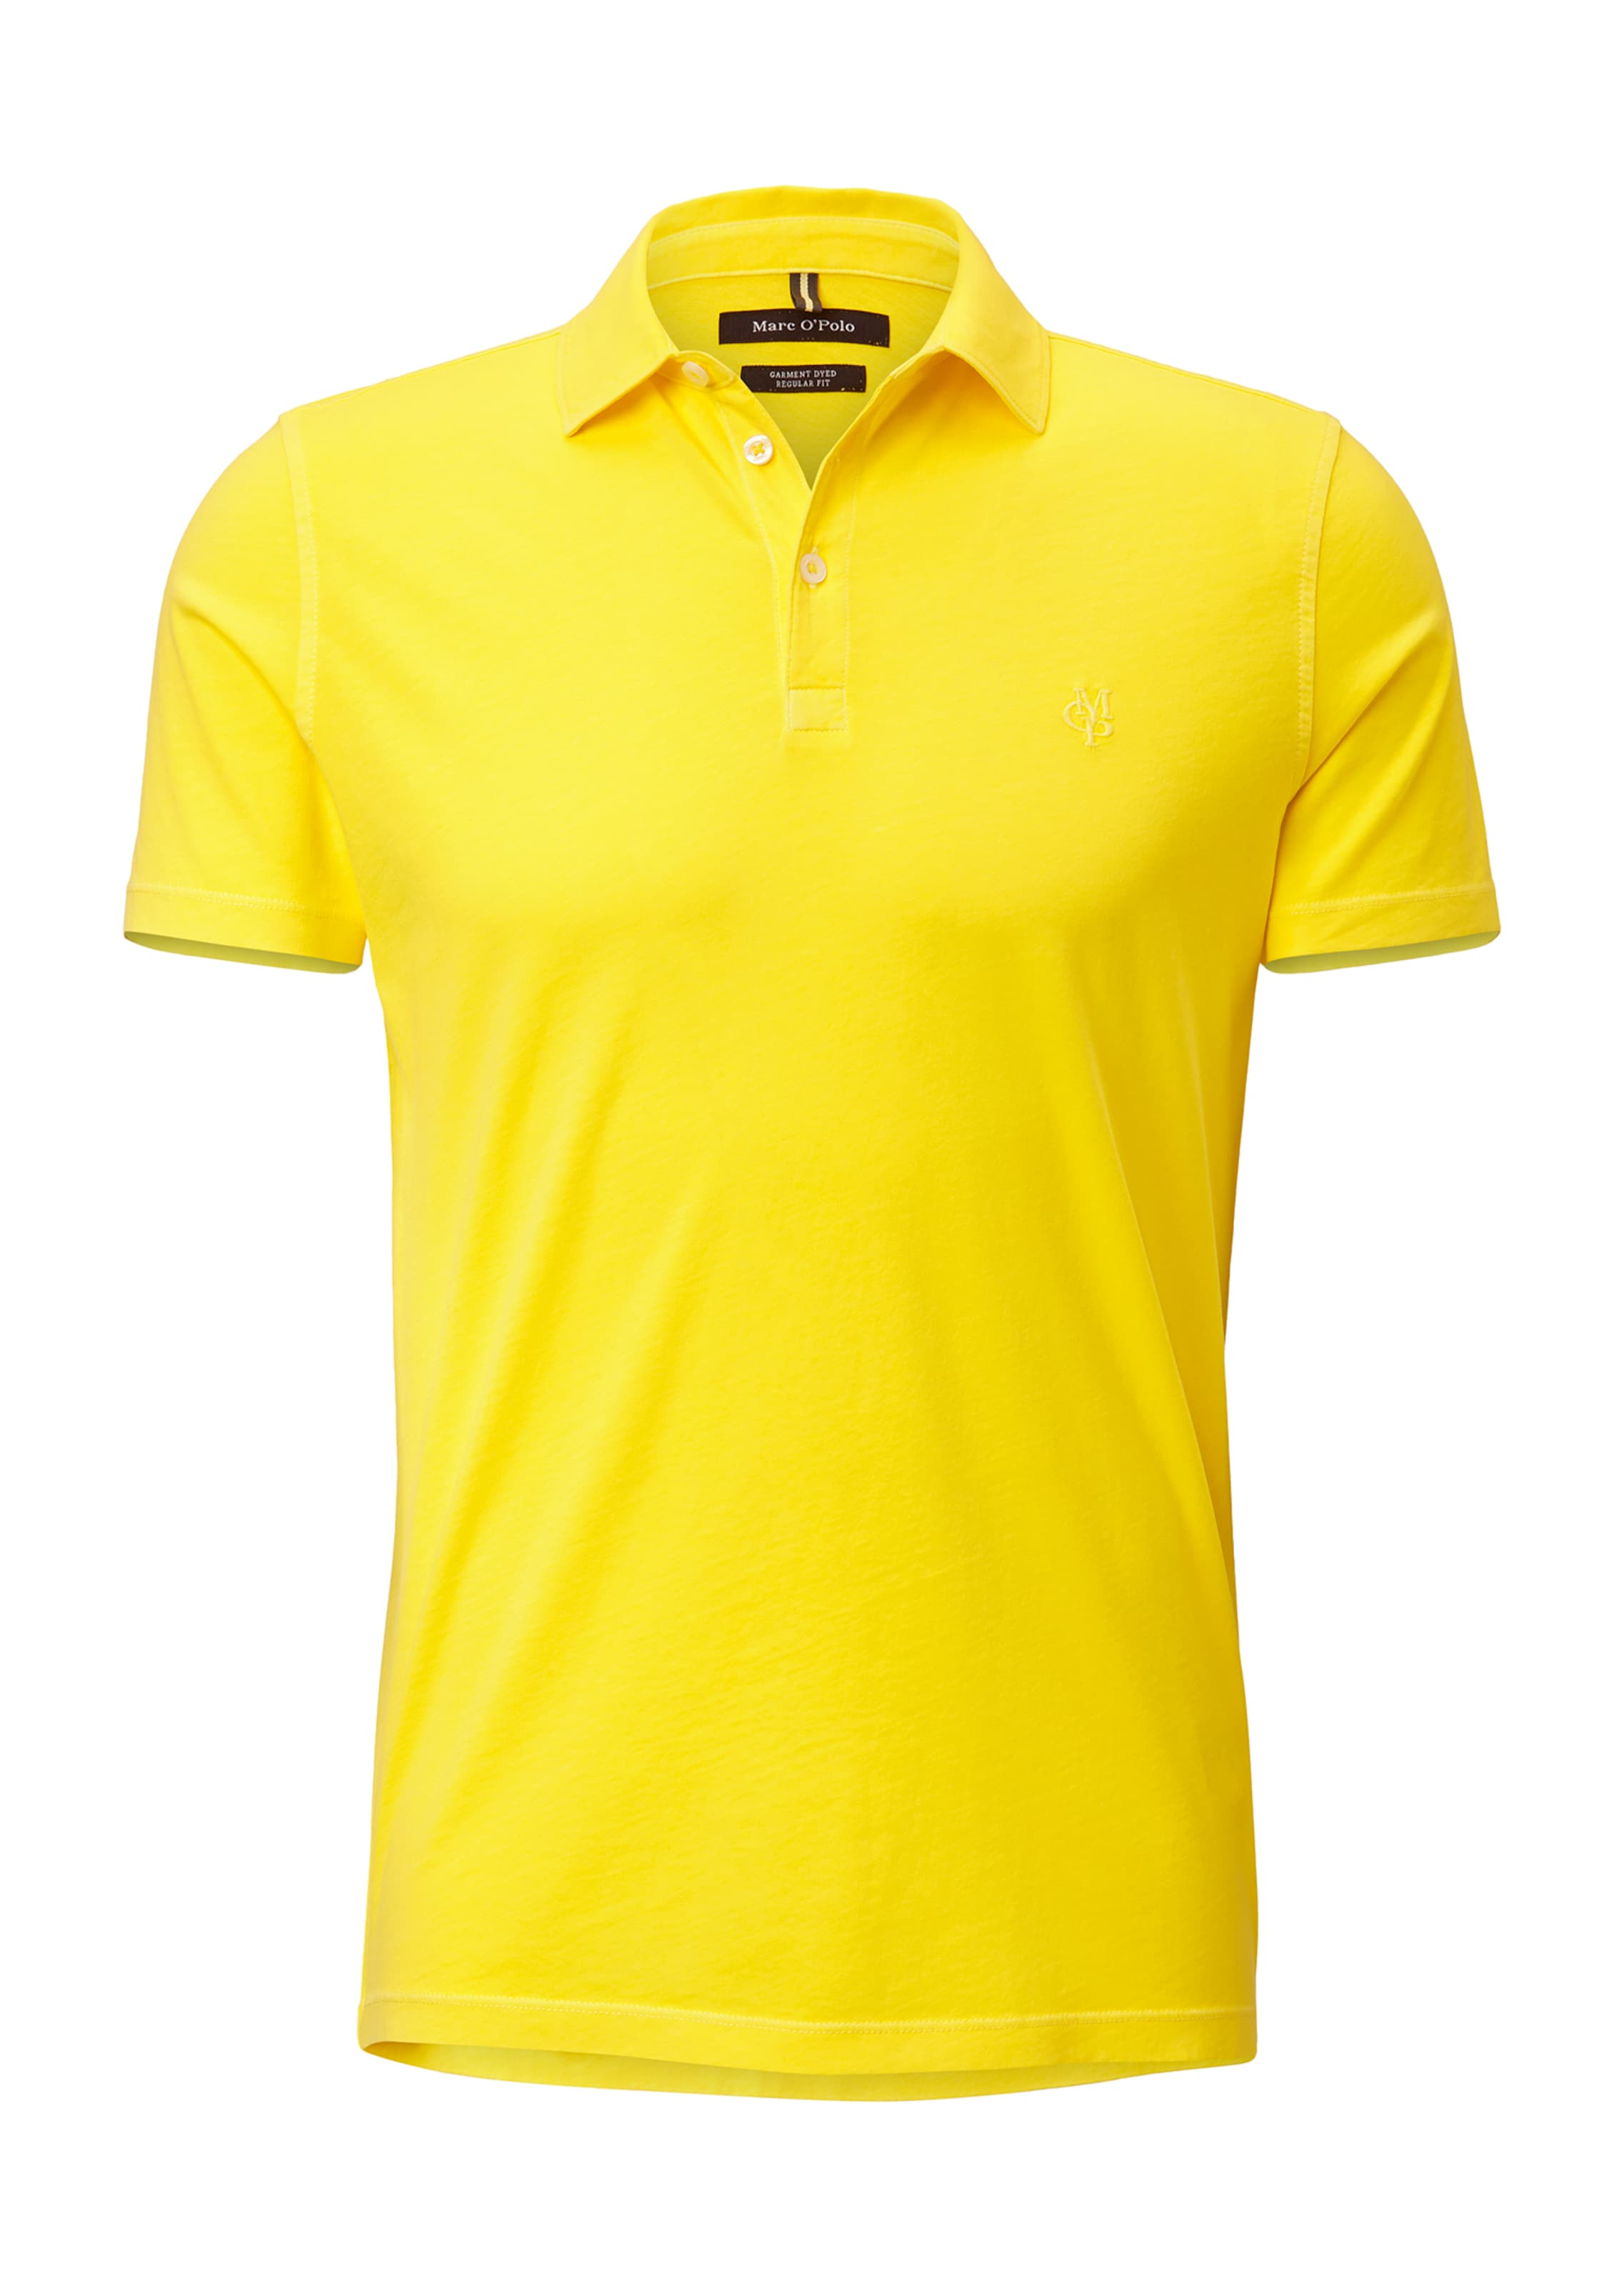 Marc Marc O'polo Gelb Shirt In Shirt O'polo trxhQdCs